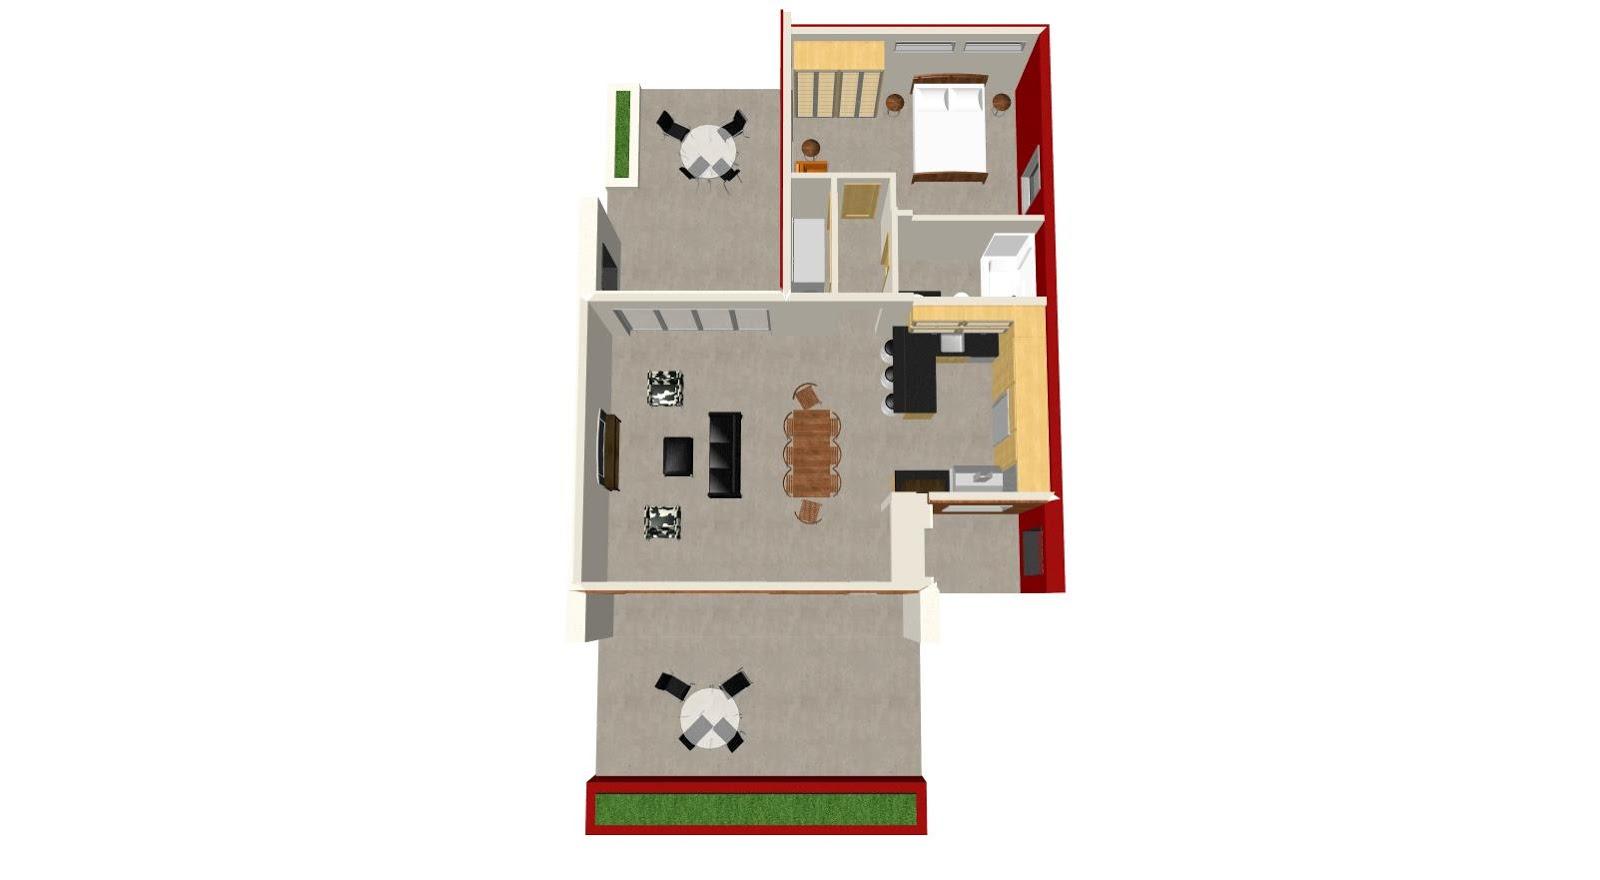 Planos de casa de 6x20 planos de casas for Planos de casas pequenas de una planta